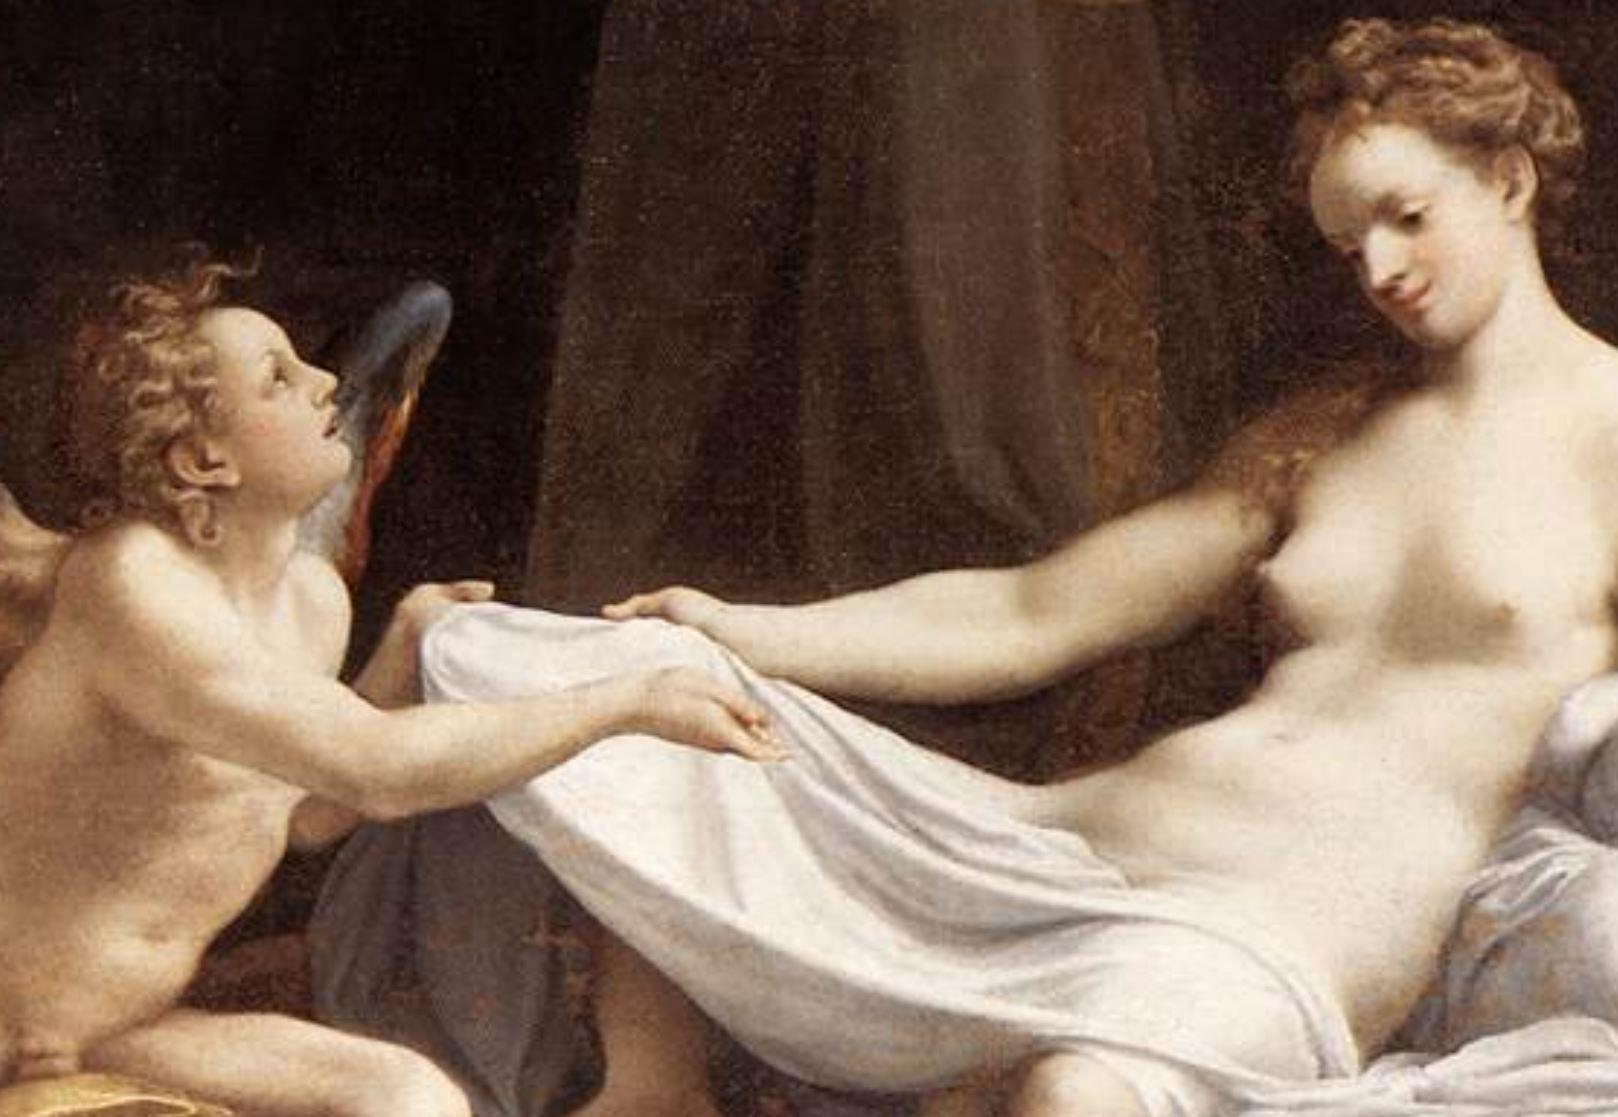 correge 1530 ca danae Galleria Borghese 158 x 189 cm detail